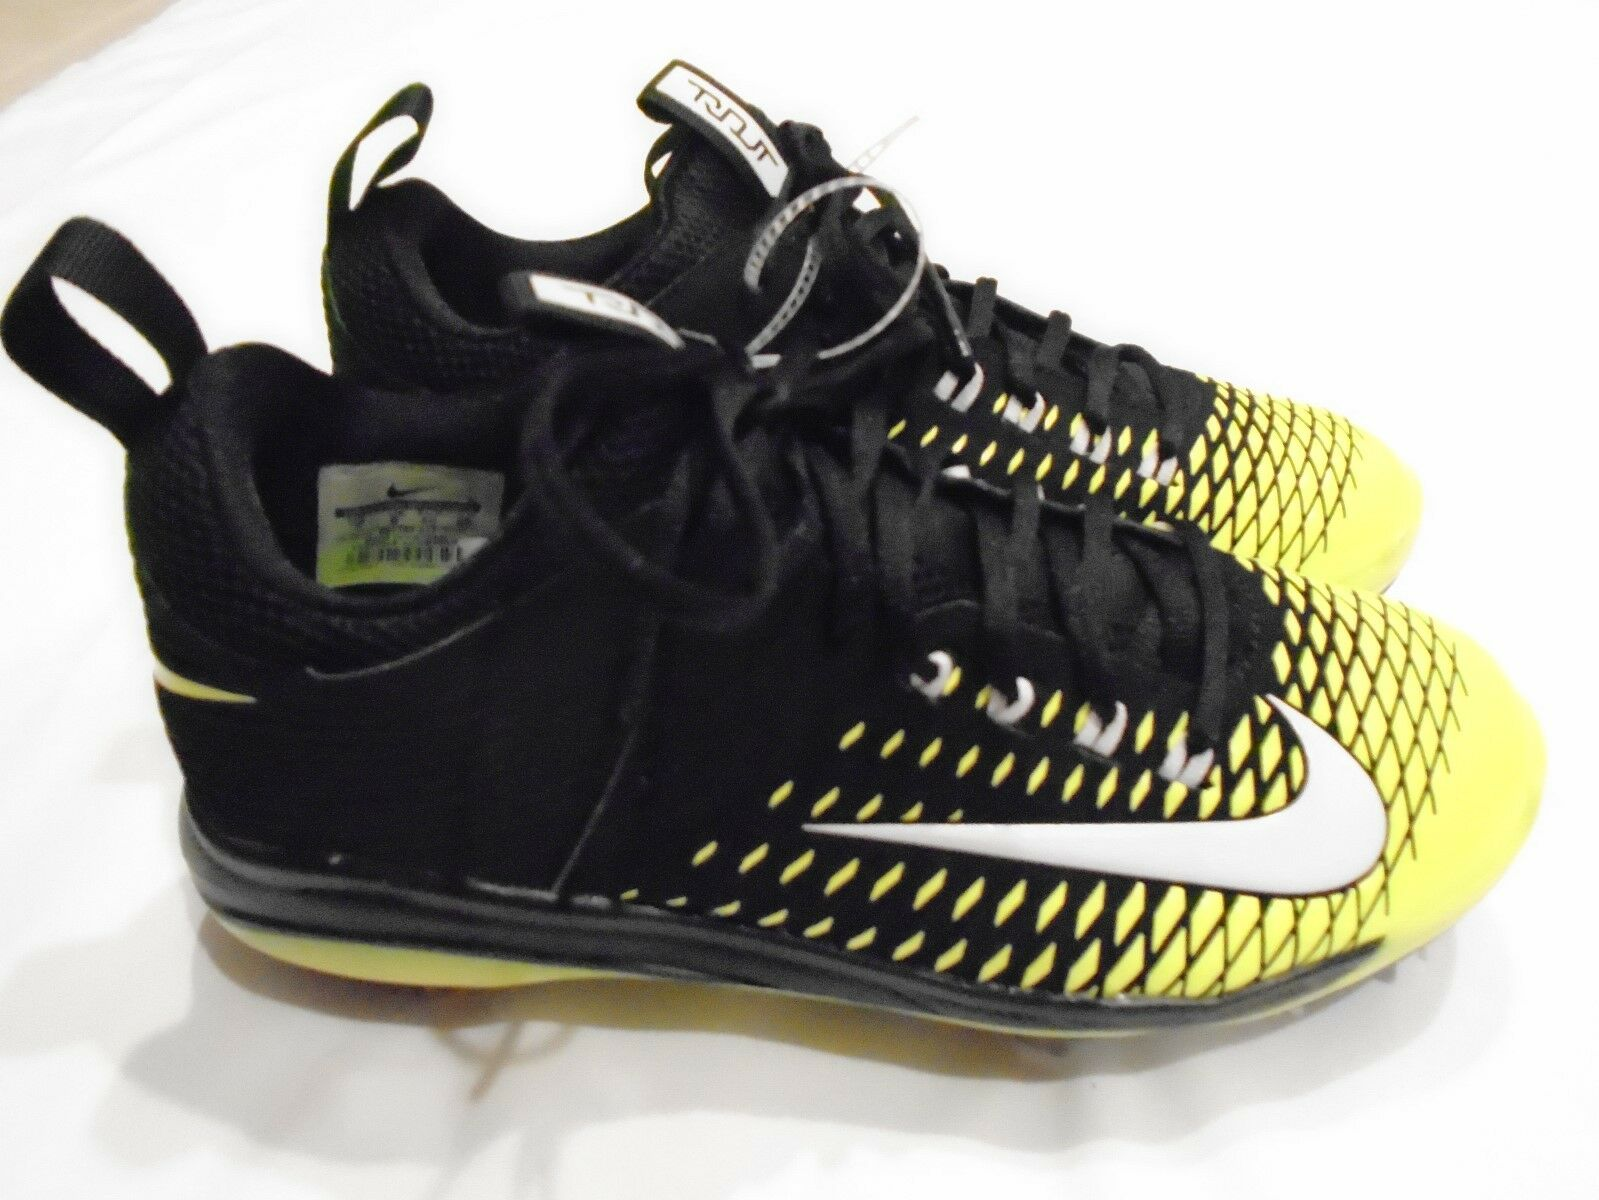 Nike maschile di aria nuova trota pro 2 pro trota basso metal scarpe da baseball 40236d